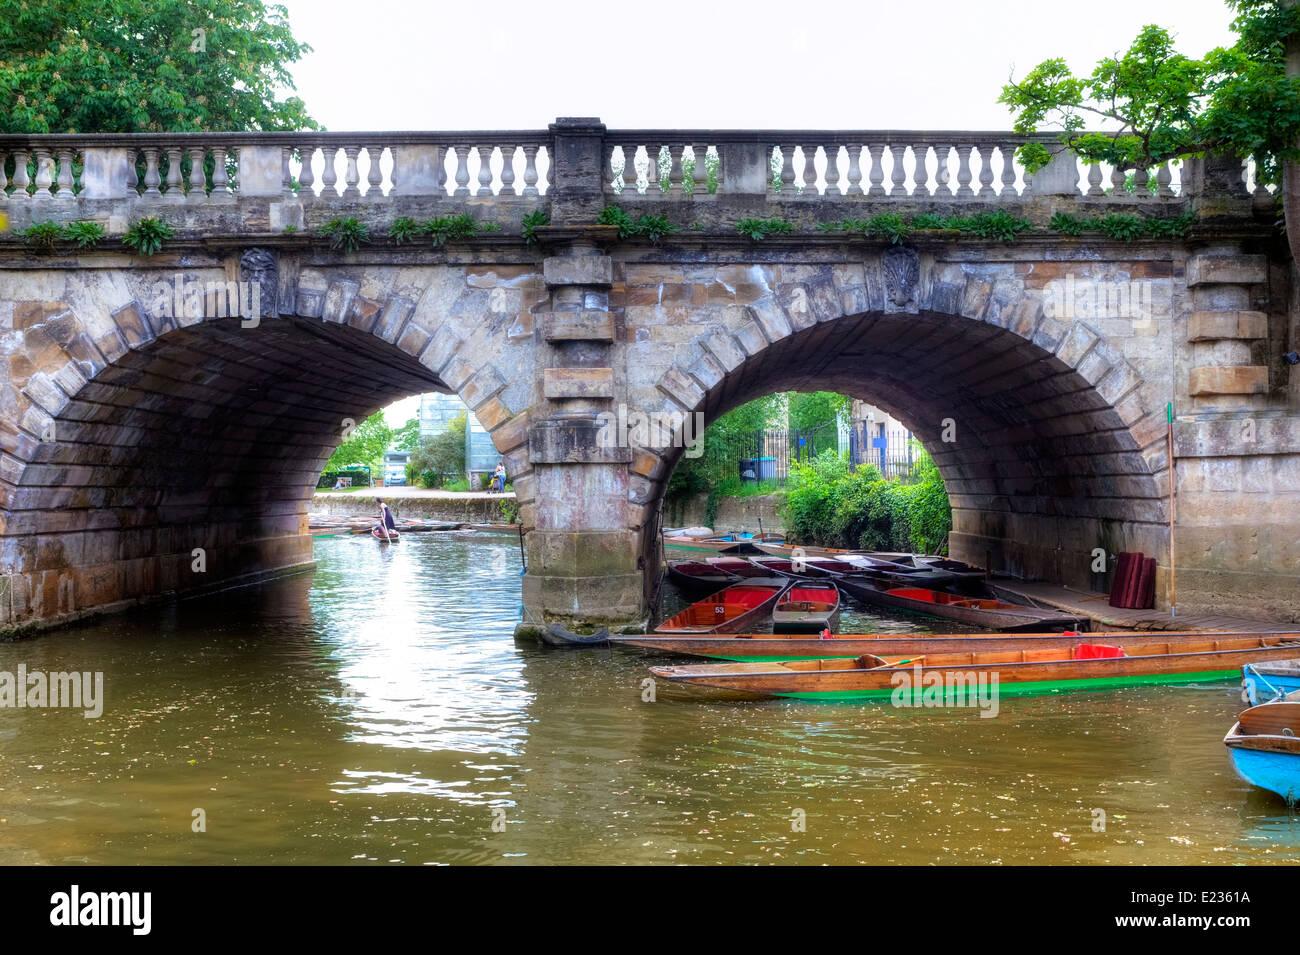 Magdalen Bridge, Punting, Oxford, Oxfordshire, England, United Kingdom - Stock Image